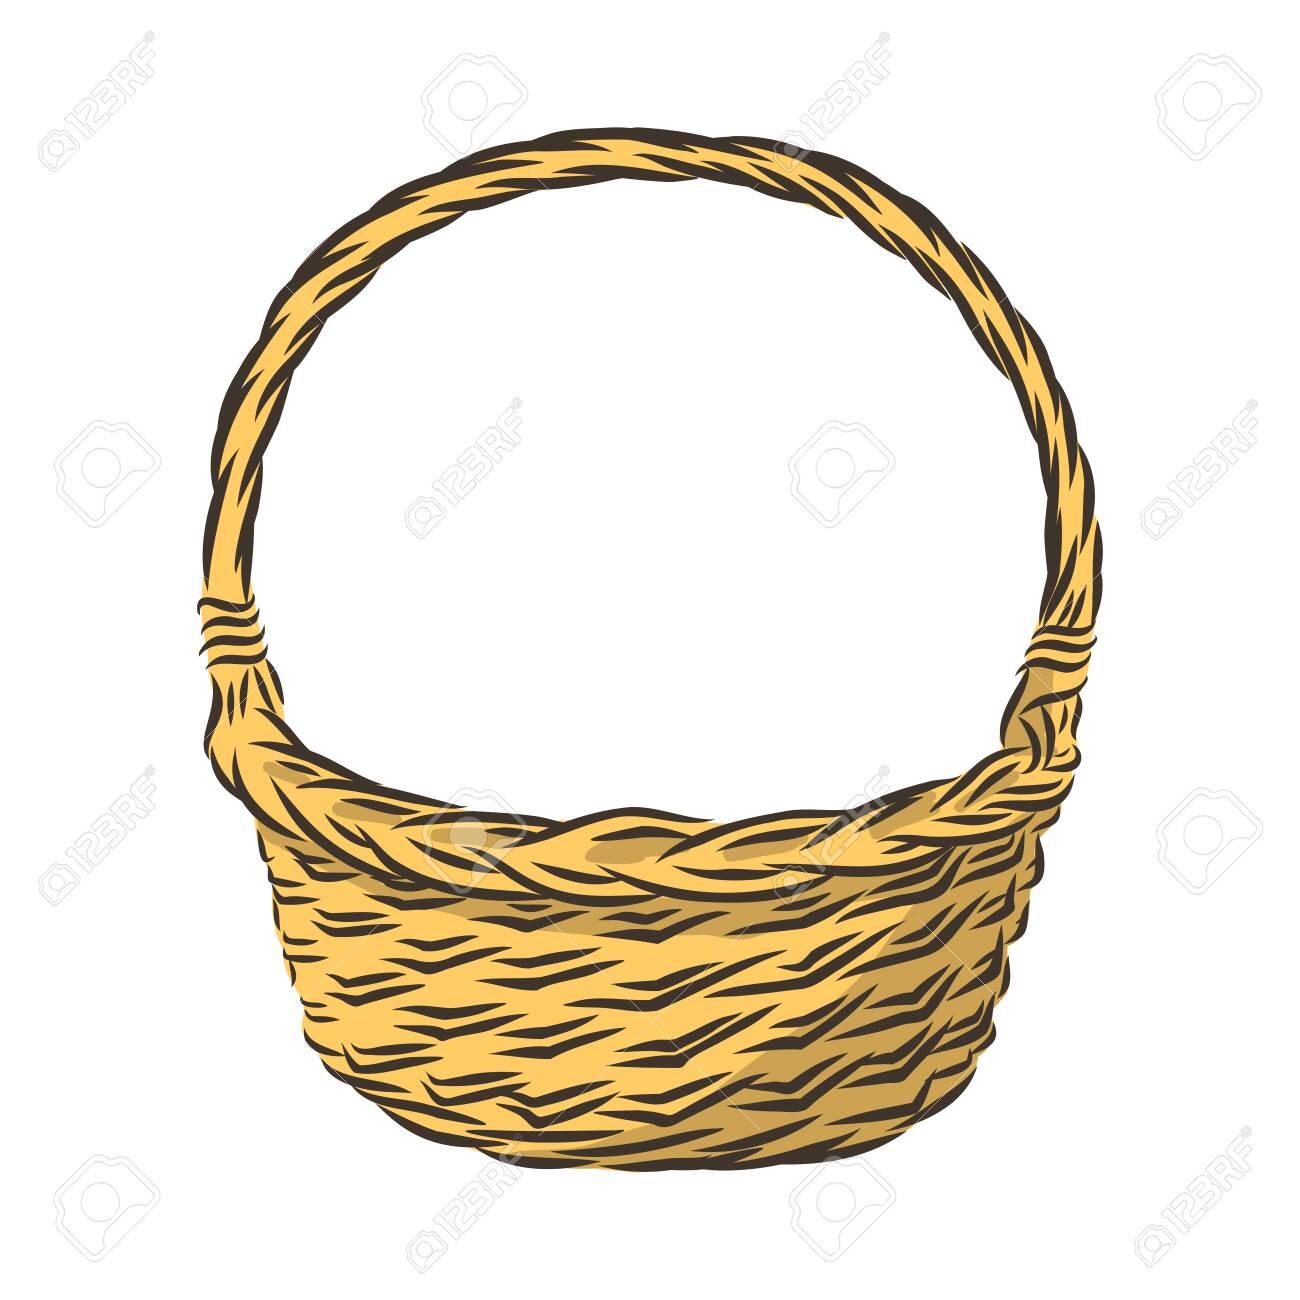 woven empty basket, gift decor vector illustration - 139574859